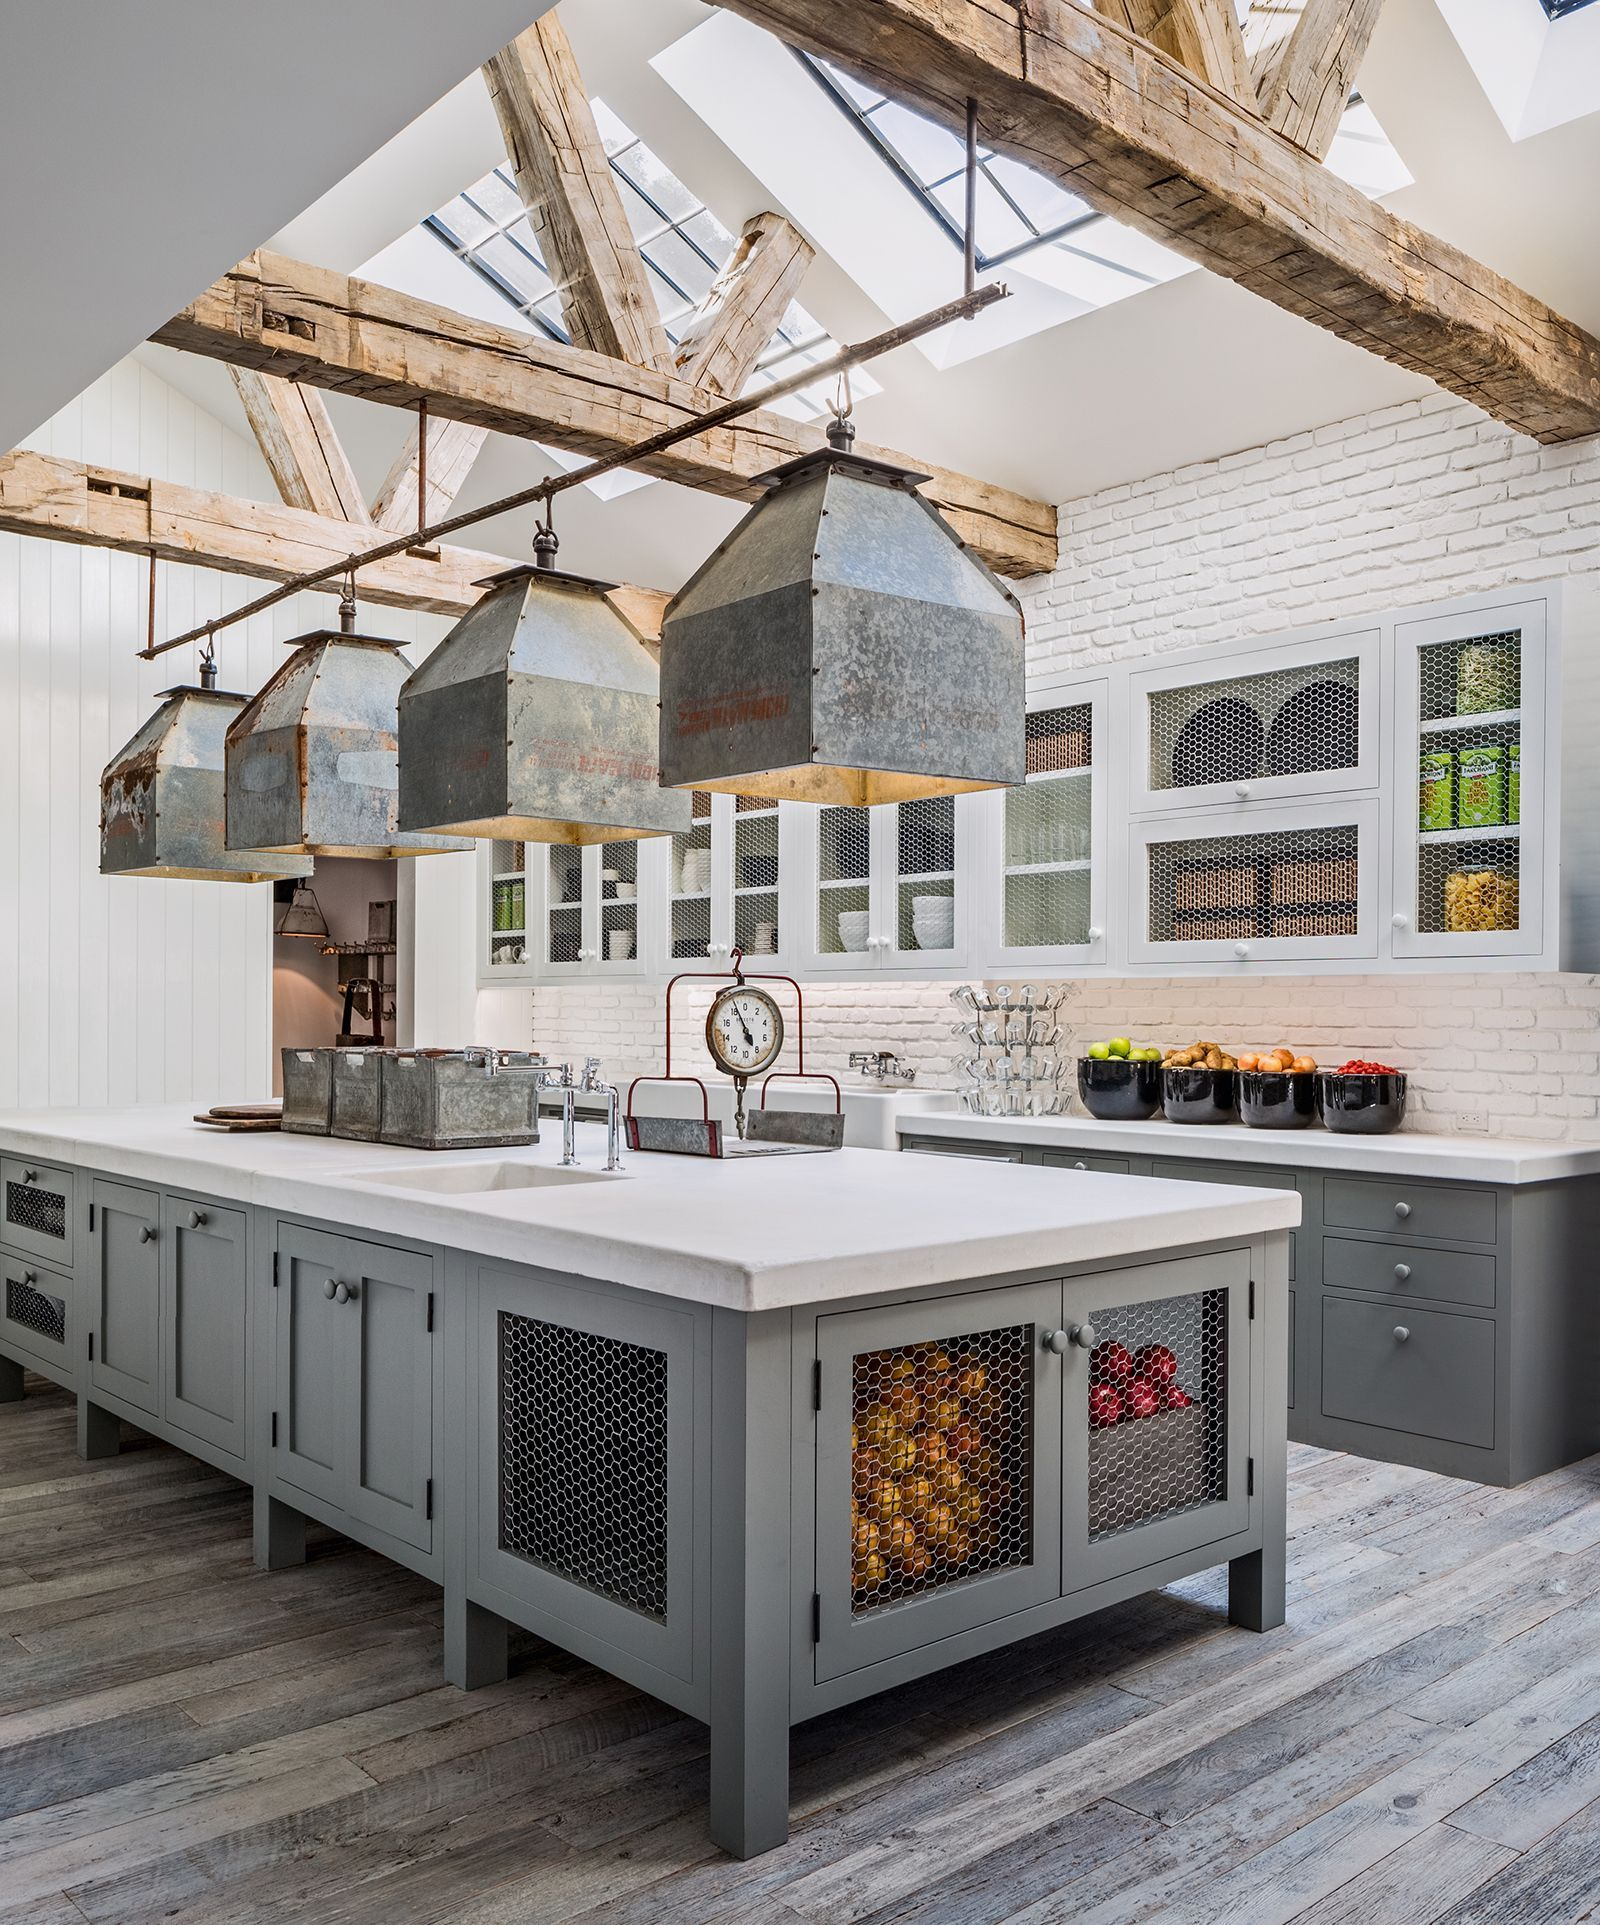 Diane Keaton S Rustic Home Is The Stuff Of Pinterest Dreams Modern Farmhouse Kitchens Farmhouse Kitchen Design Rustic Farmhouse Kitchen